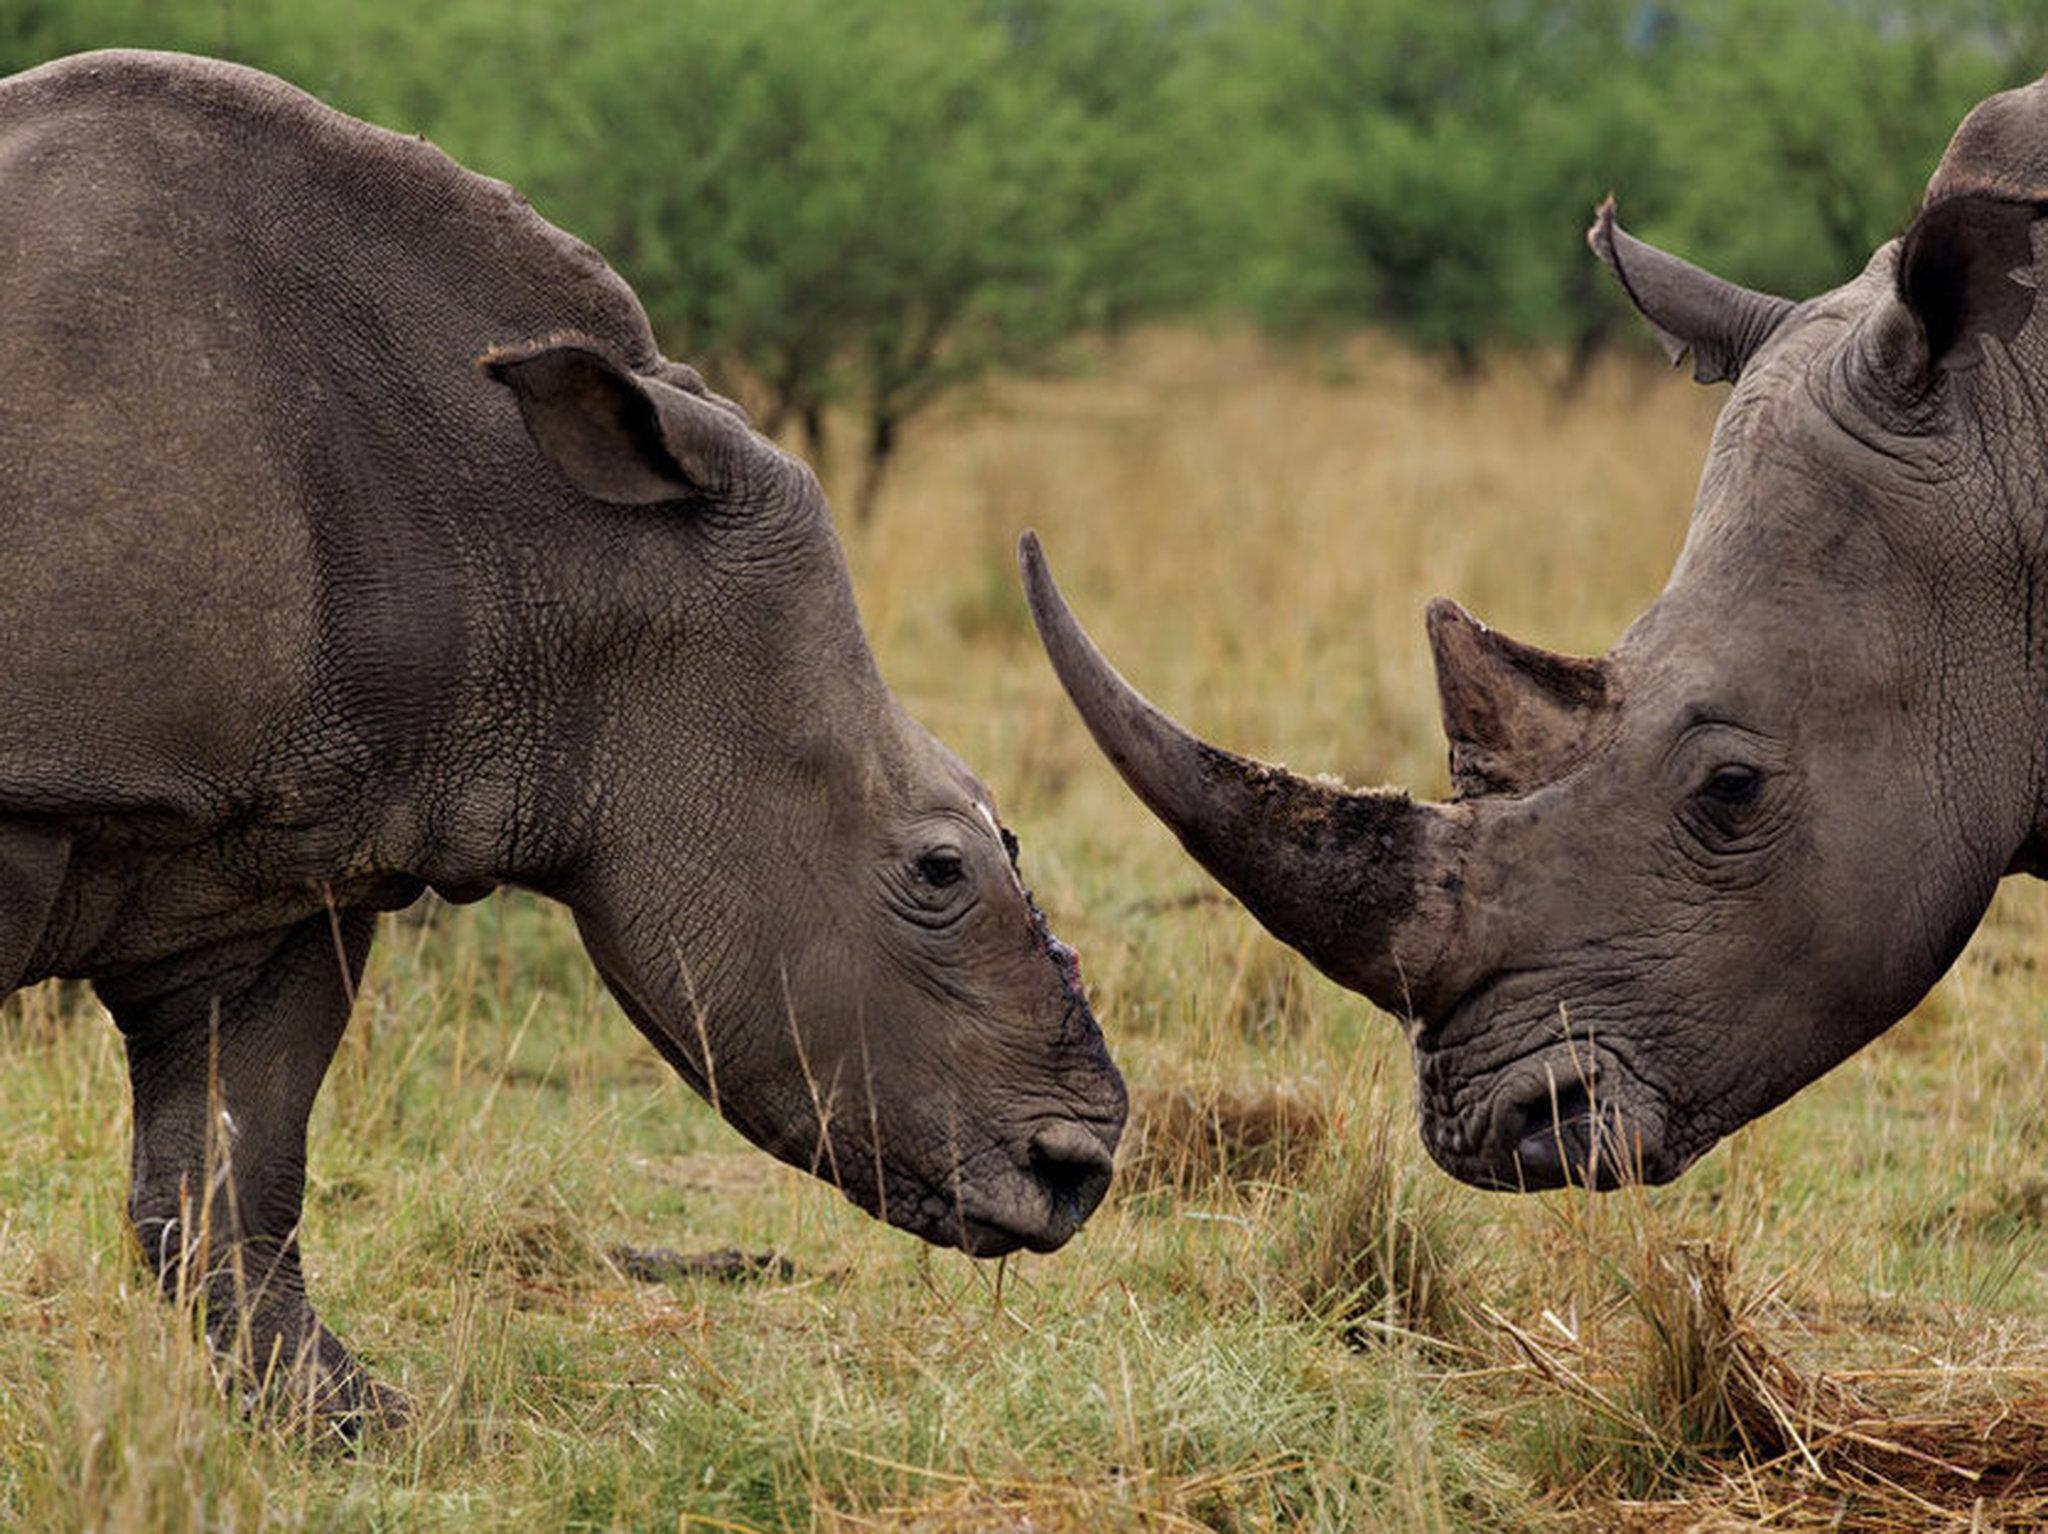 Drawn rhino battle Rhino Province bull companion after